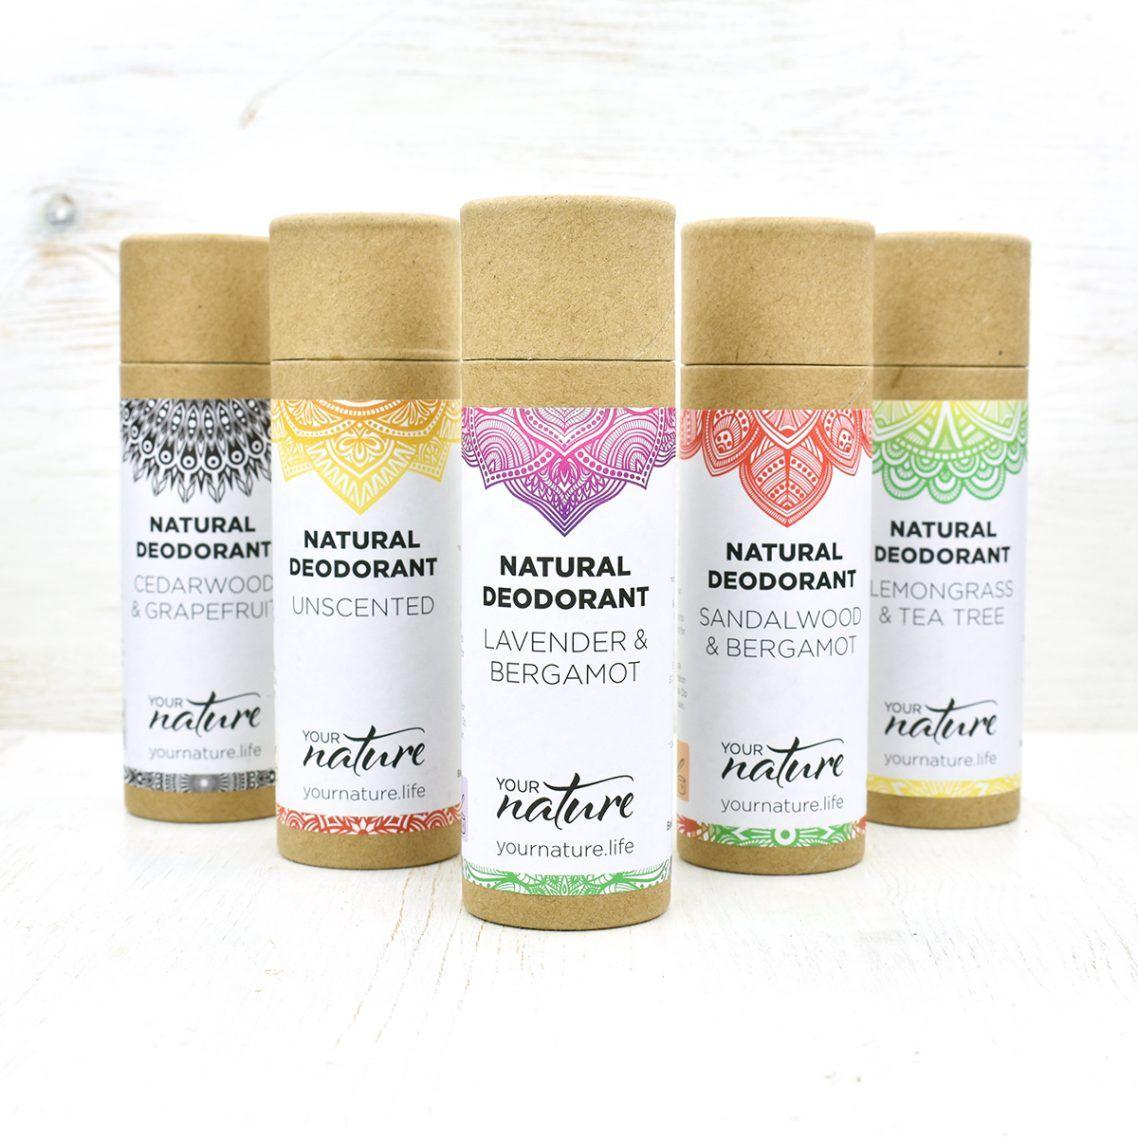 Natural Deodorant Stick Lemongrass & Tea Tree 70g Your